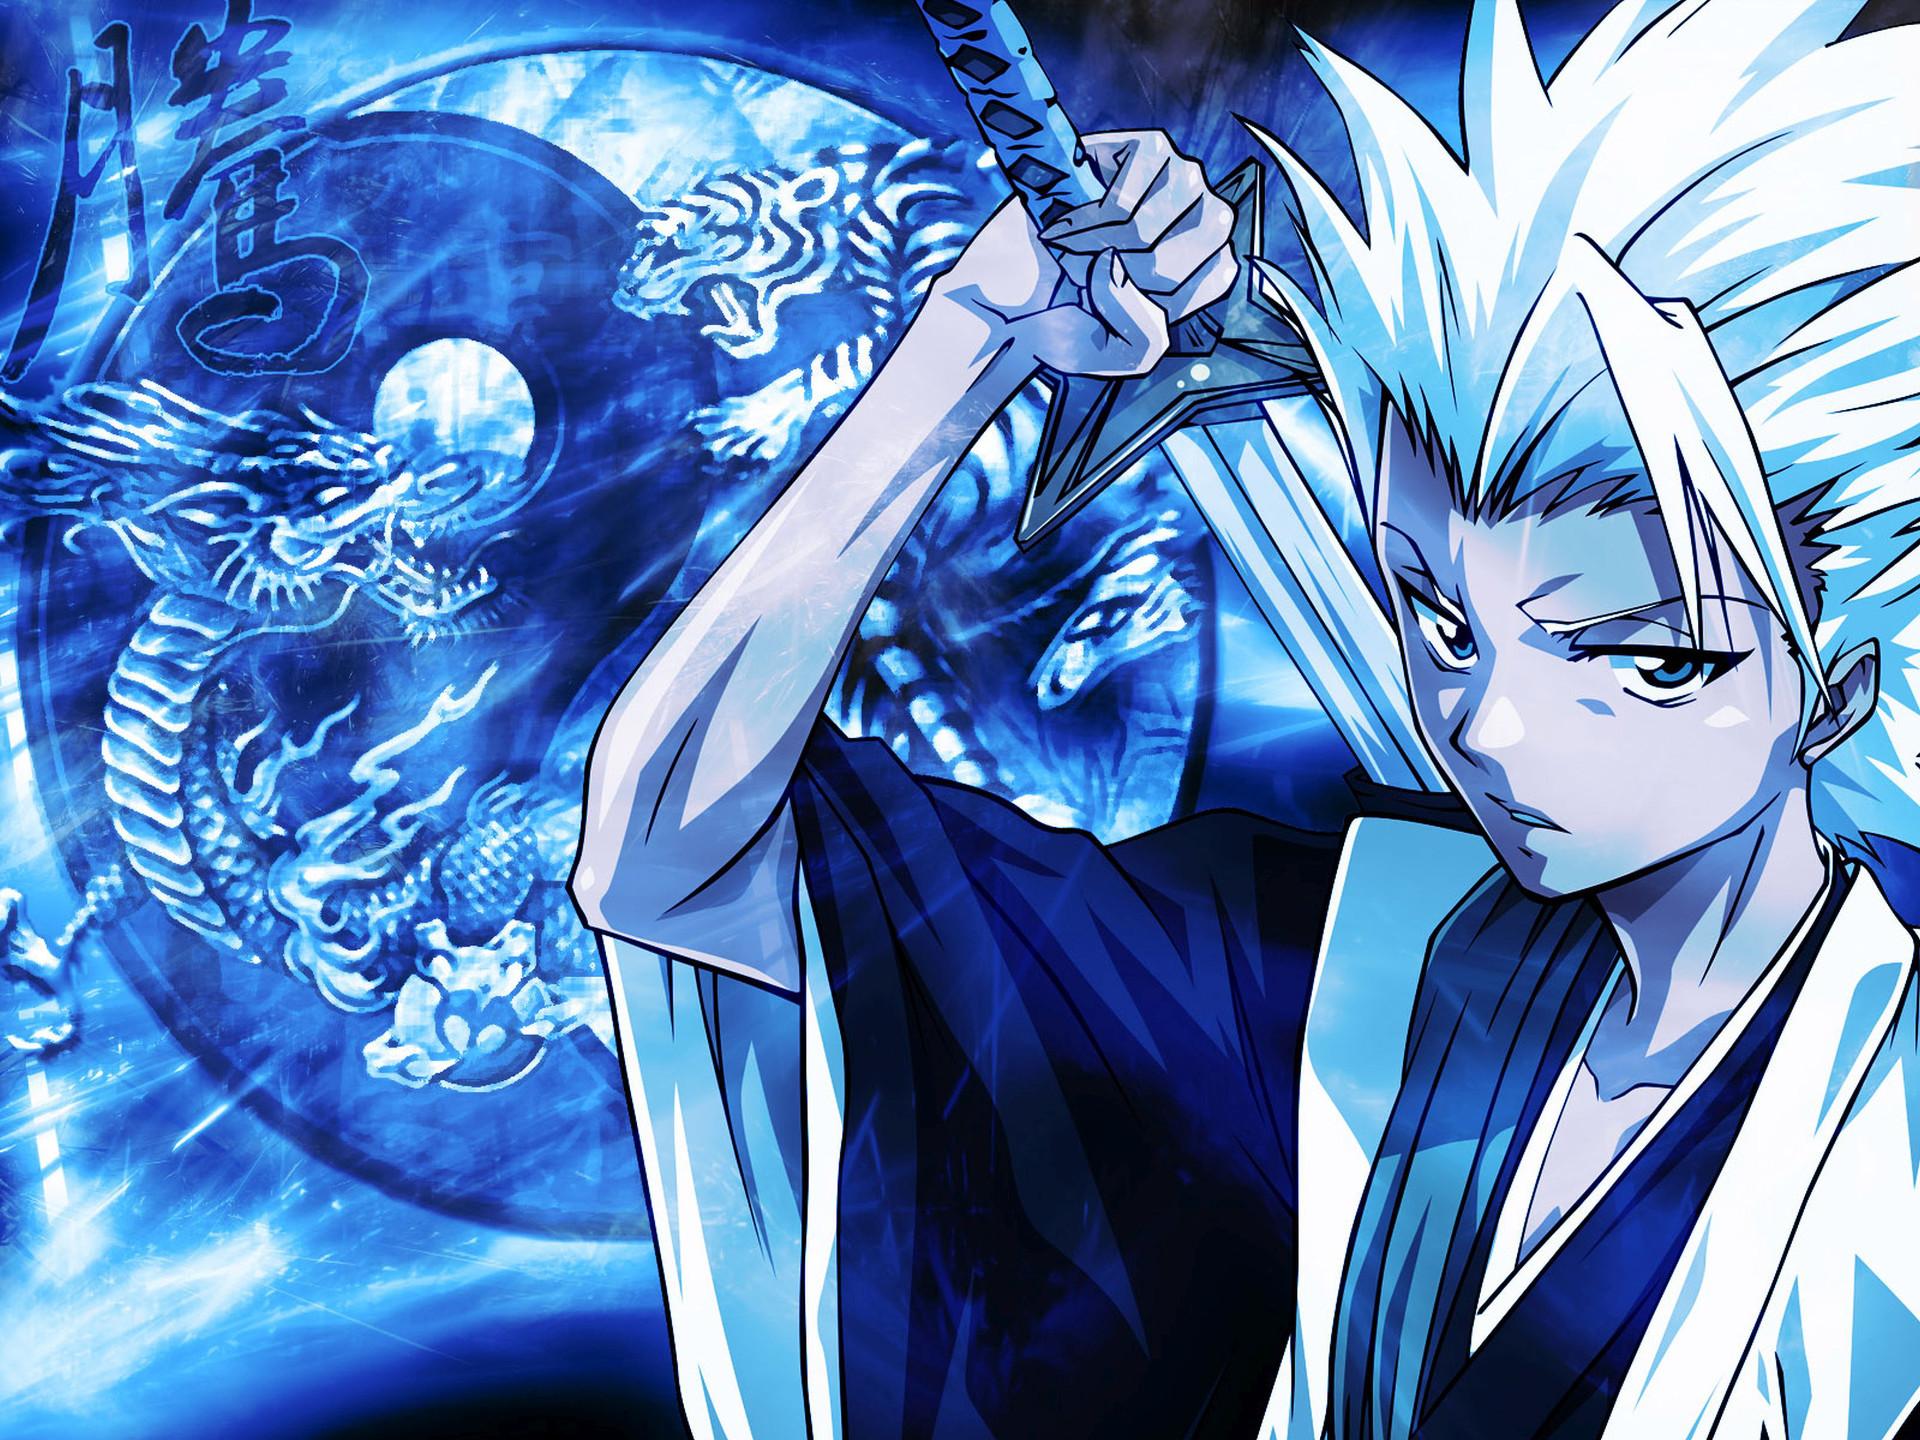 Anime Wallpaper For Windows 10 78 Images